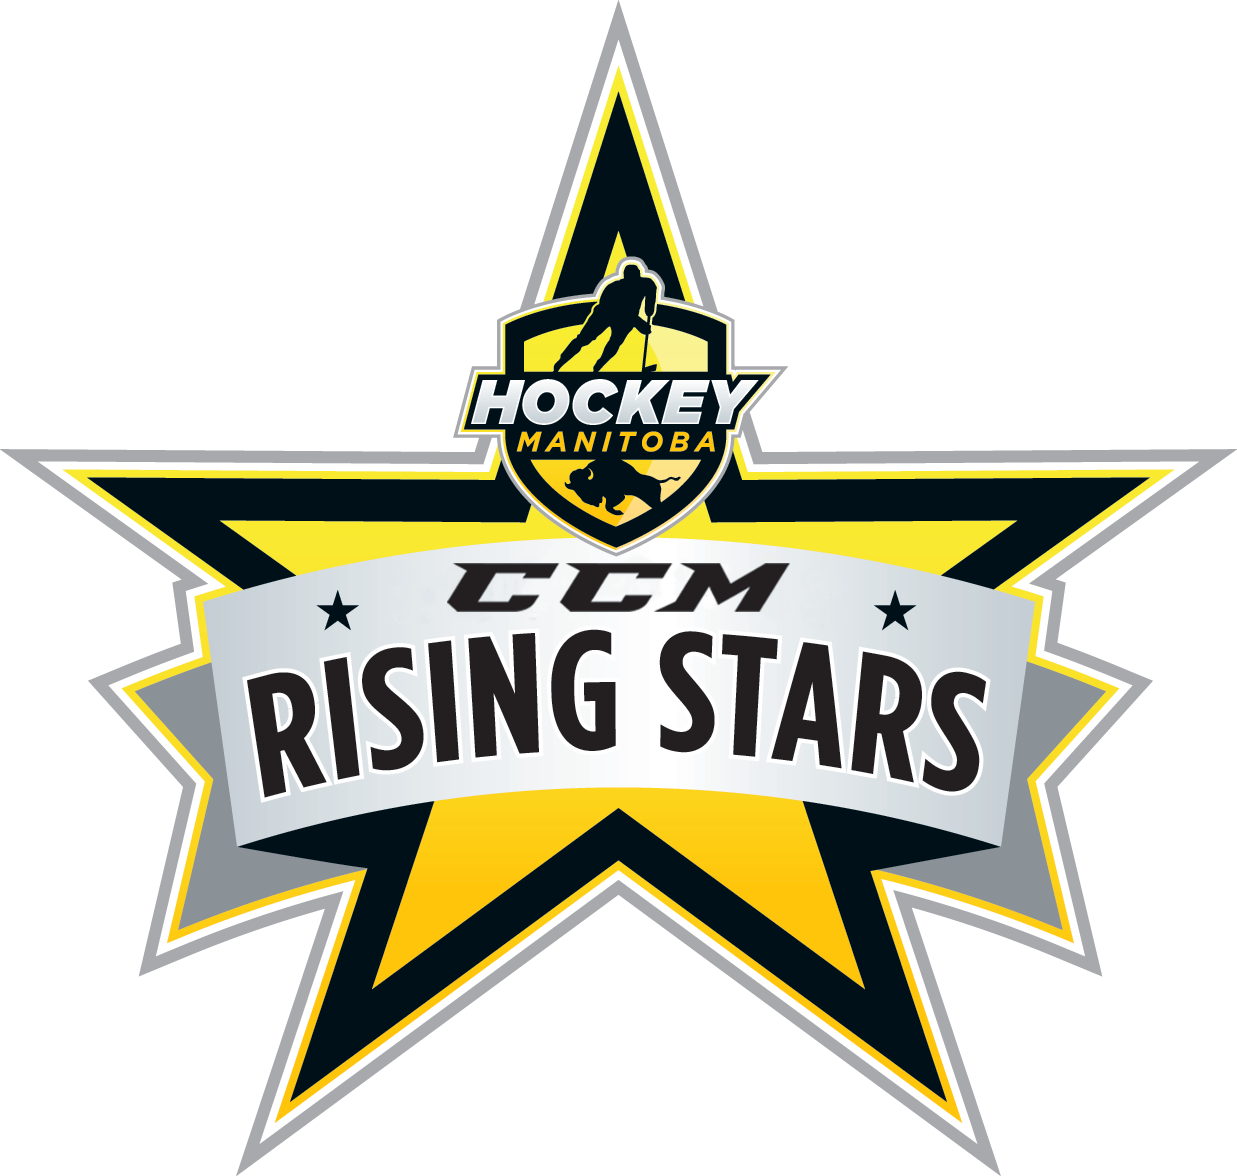 CCMrising_stars_FIN2